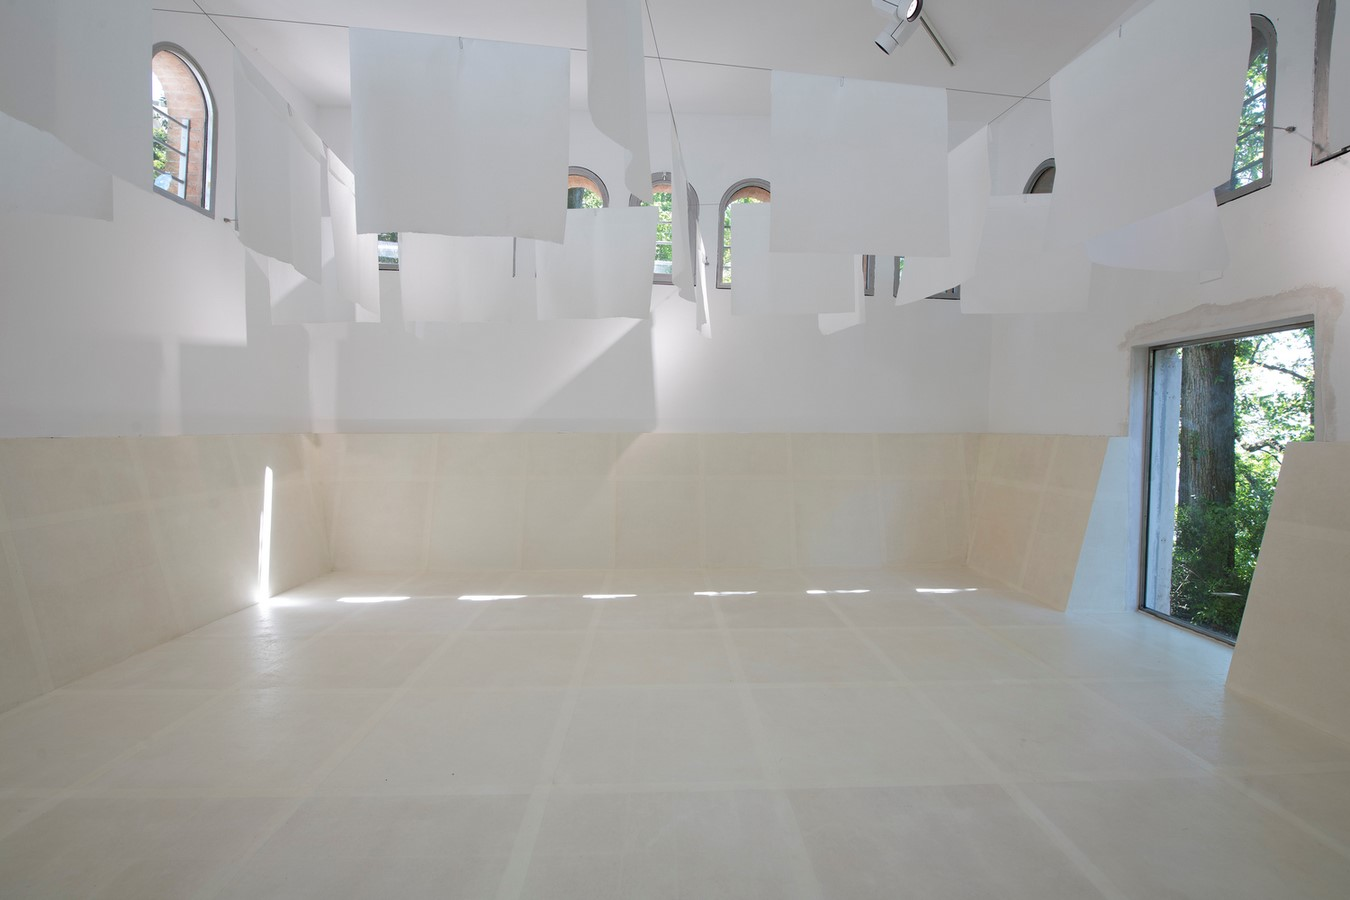 Korean Pavilion Reimagines Traditional Schools at the 2021 Venice Biennale Sheet7